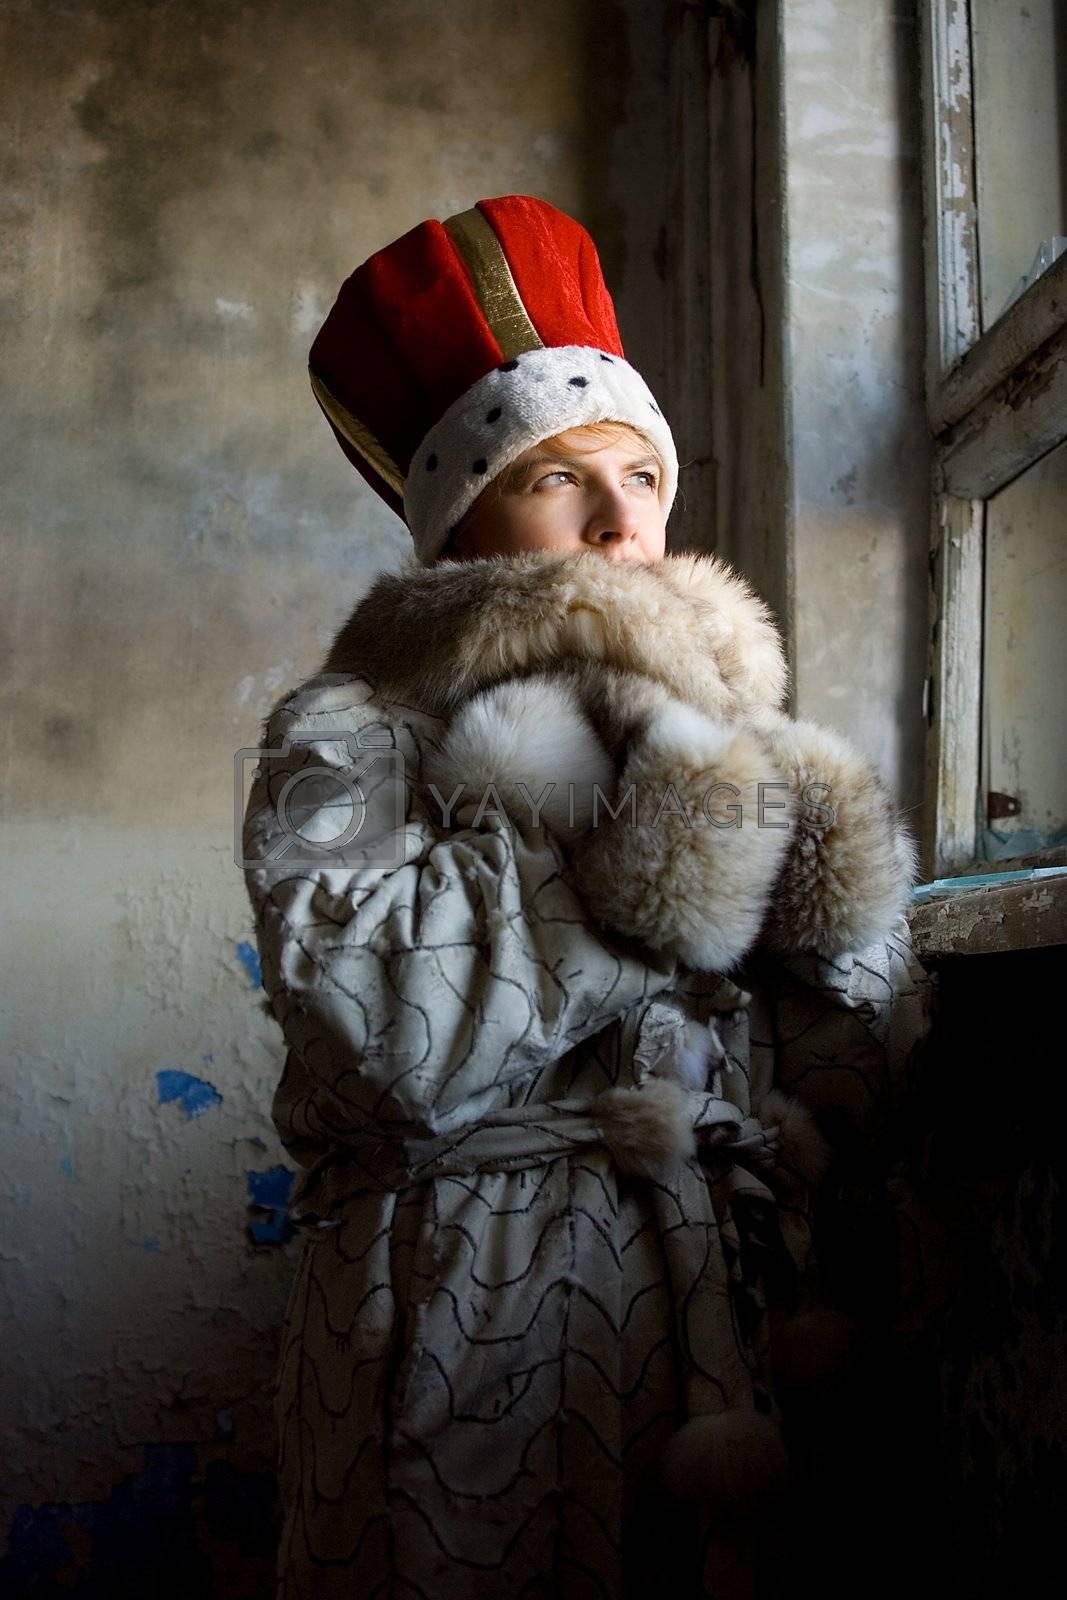 cold winter portrait